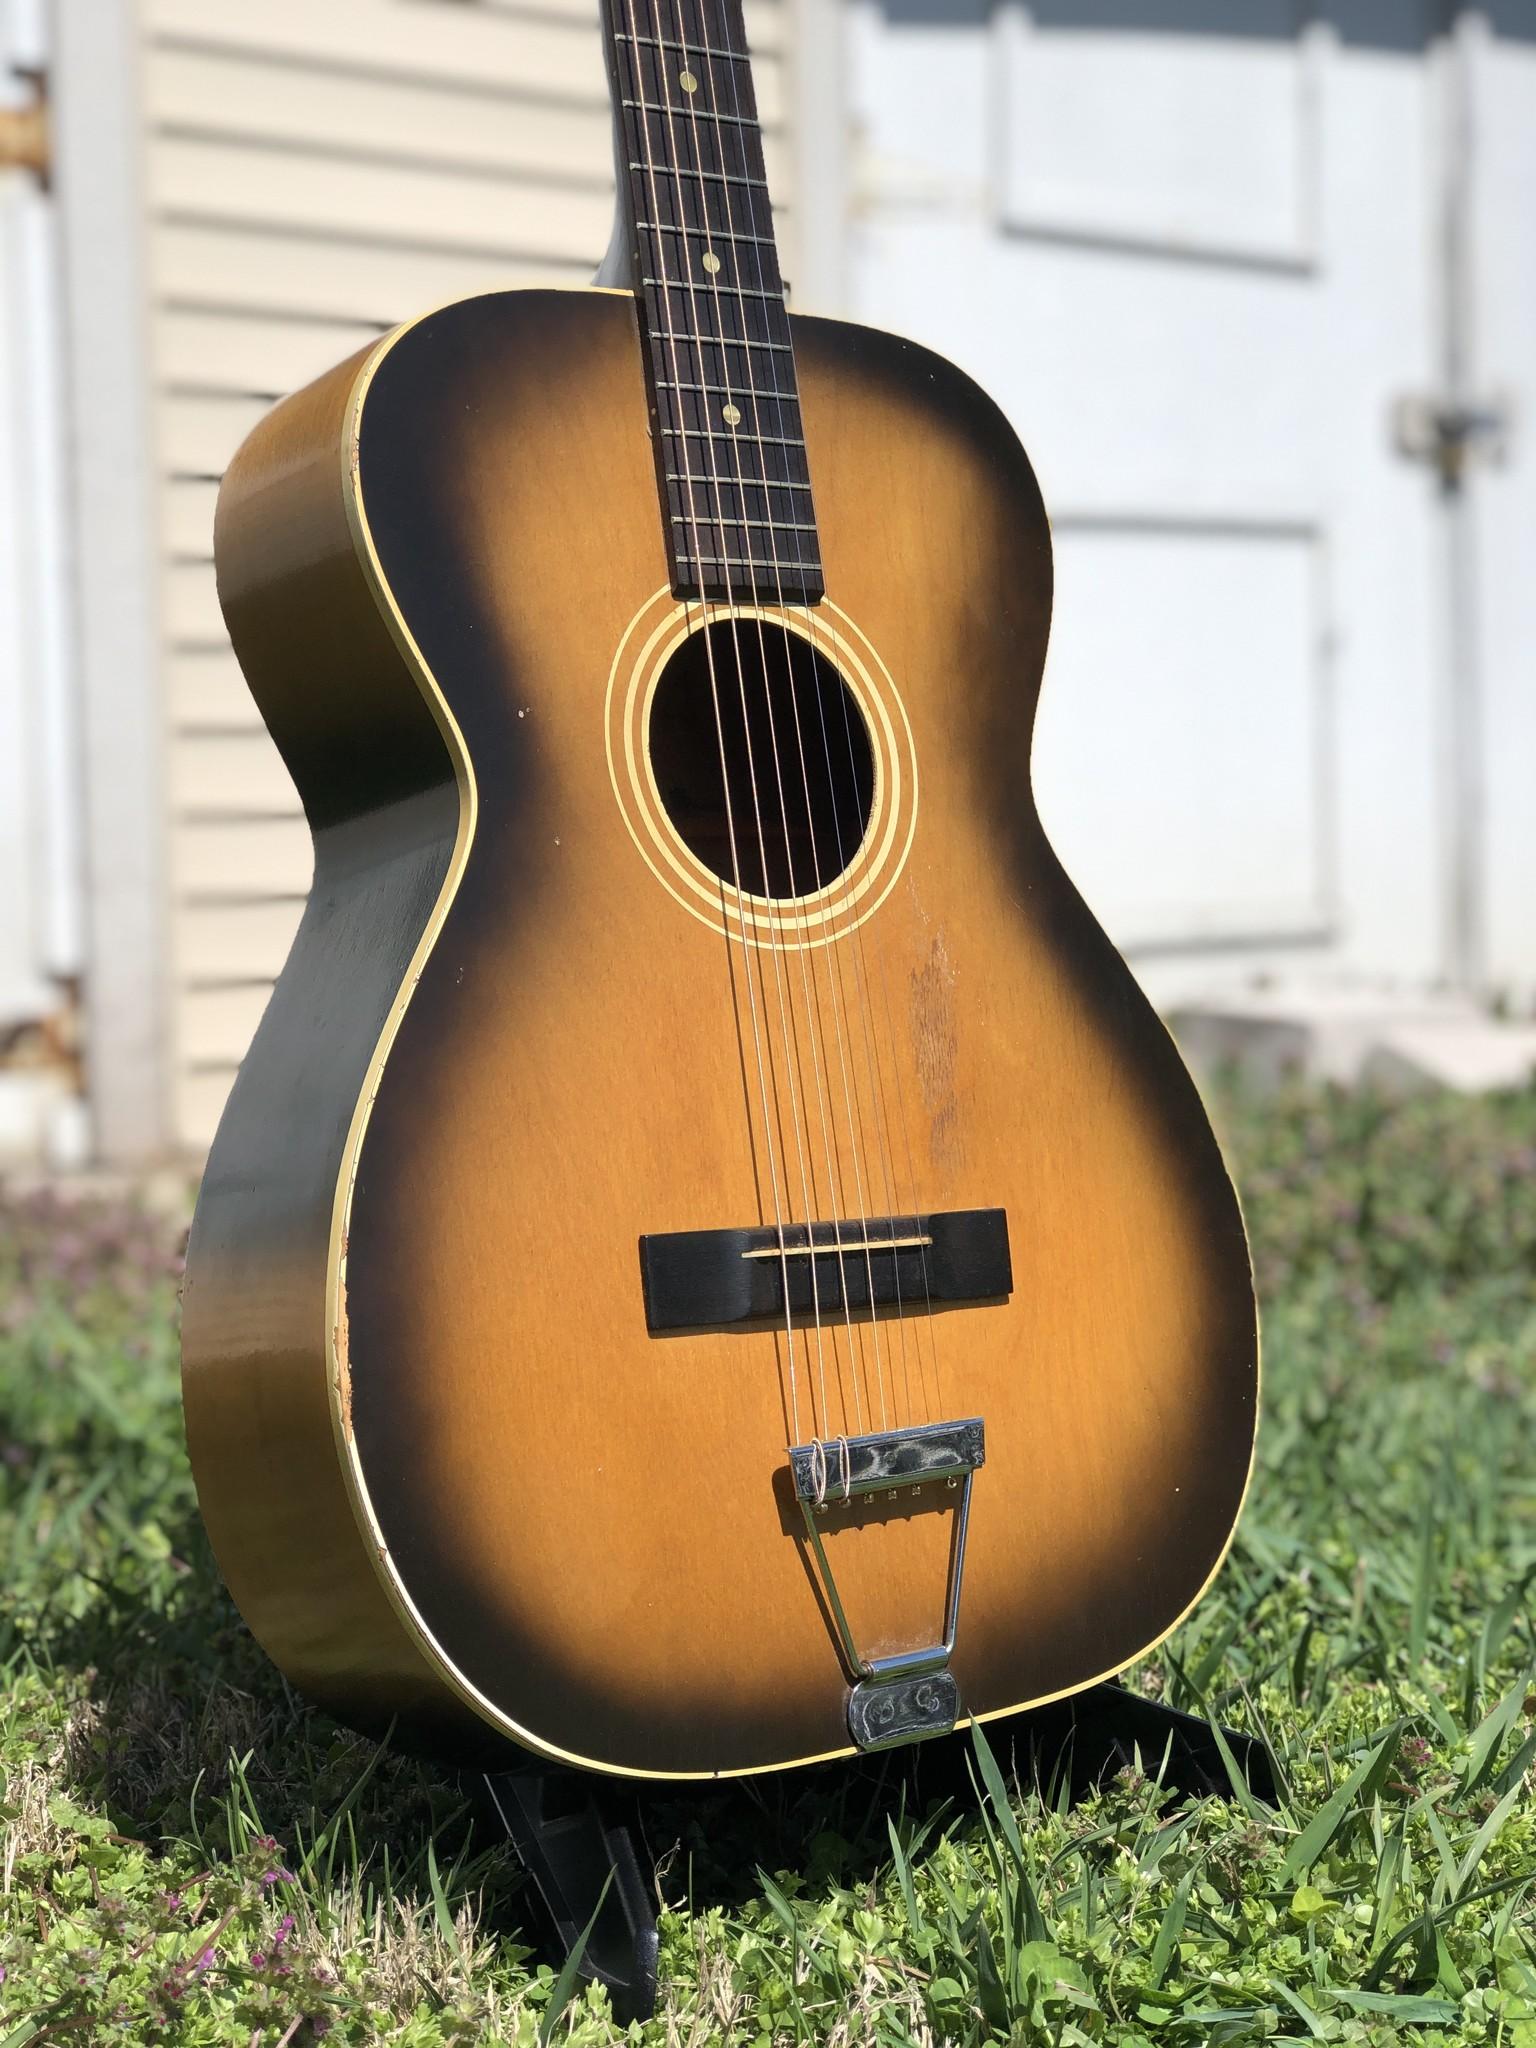 1960s Stella 12-string (strung up for 6 string) 7164 H922-2